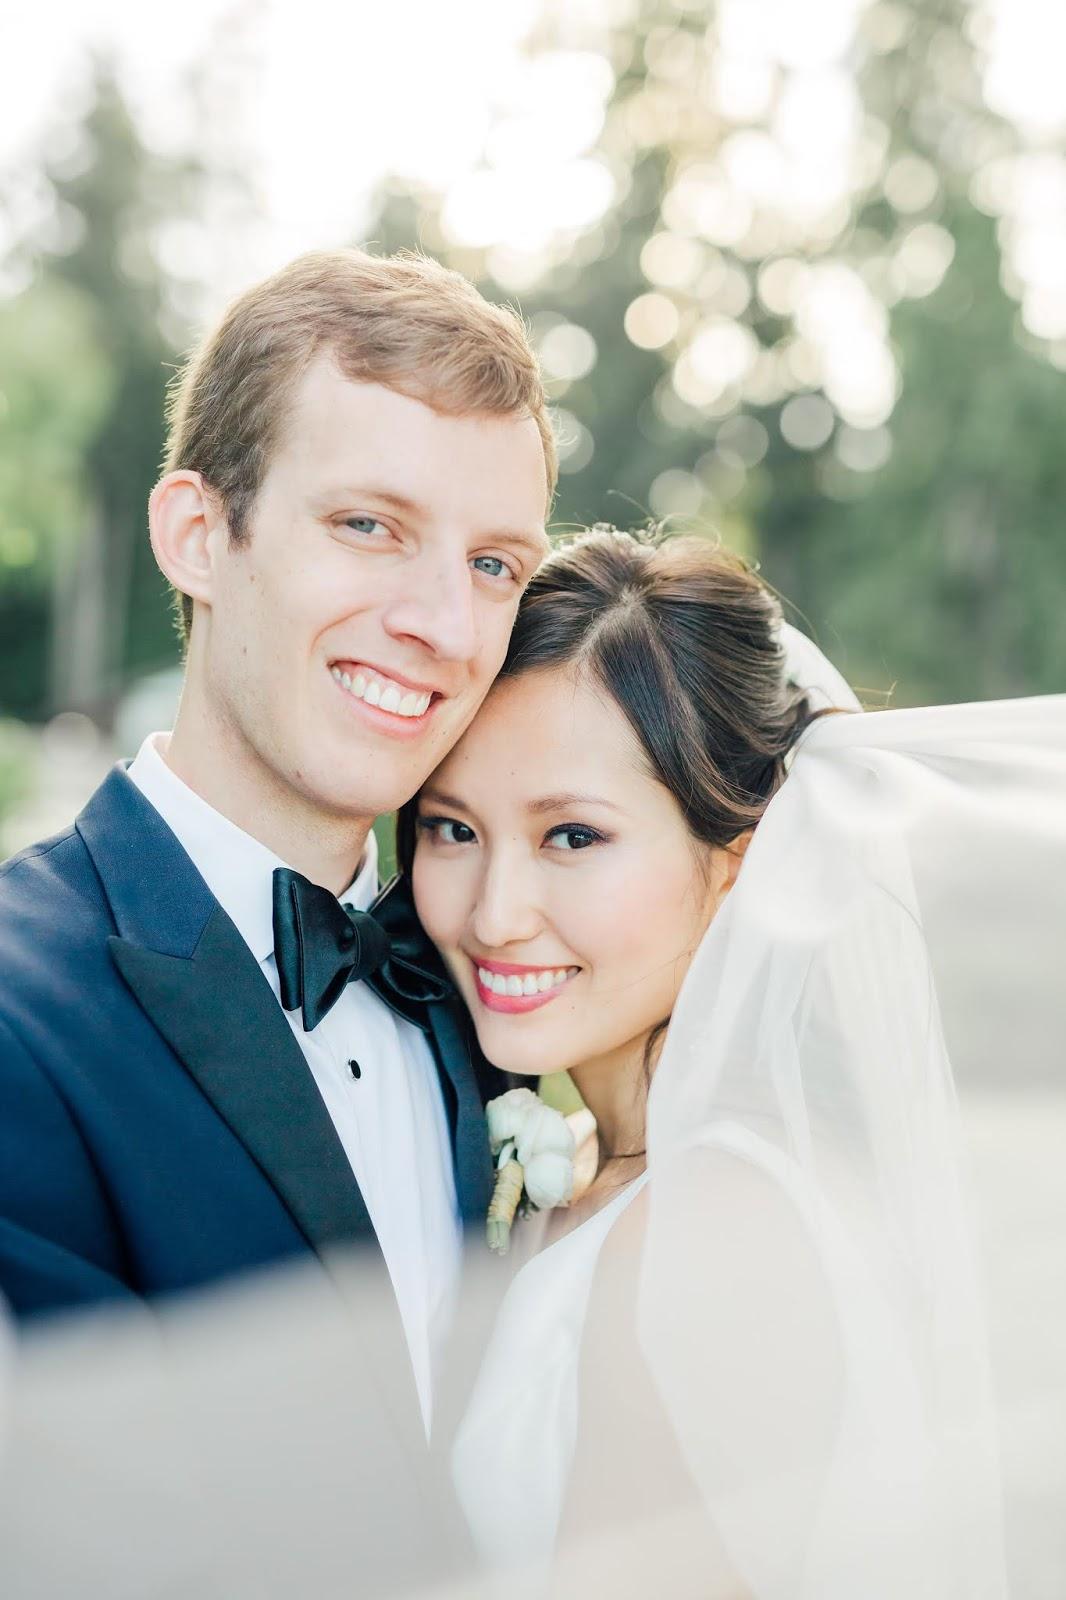 First Look Photography-Kiana Lodge Wedding-Garden Wedding Inspiration-Bainbridge Photographers-Something Minted Photography